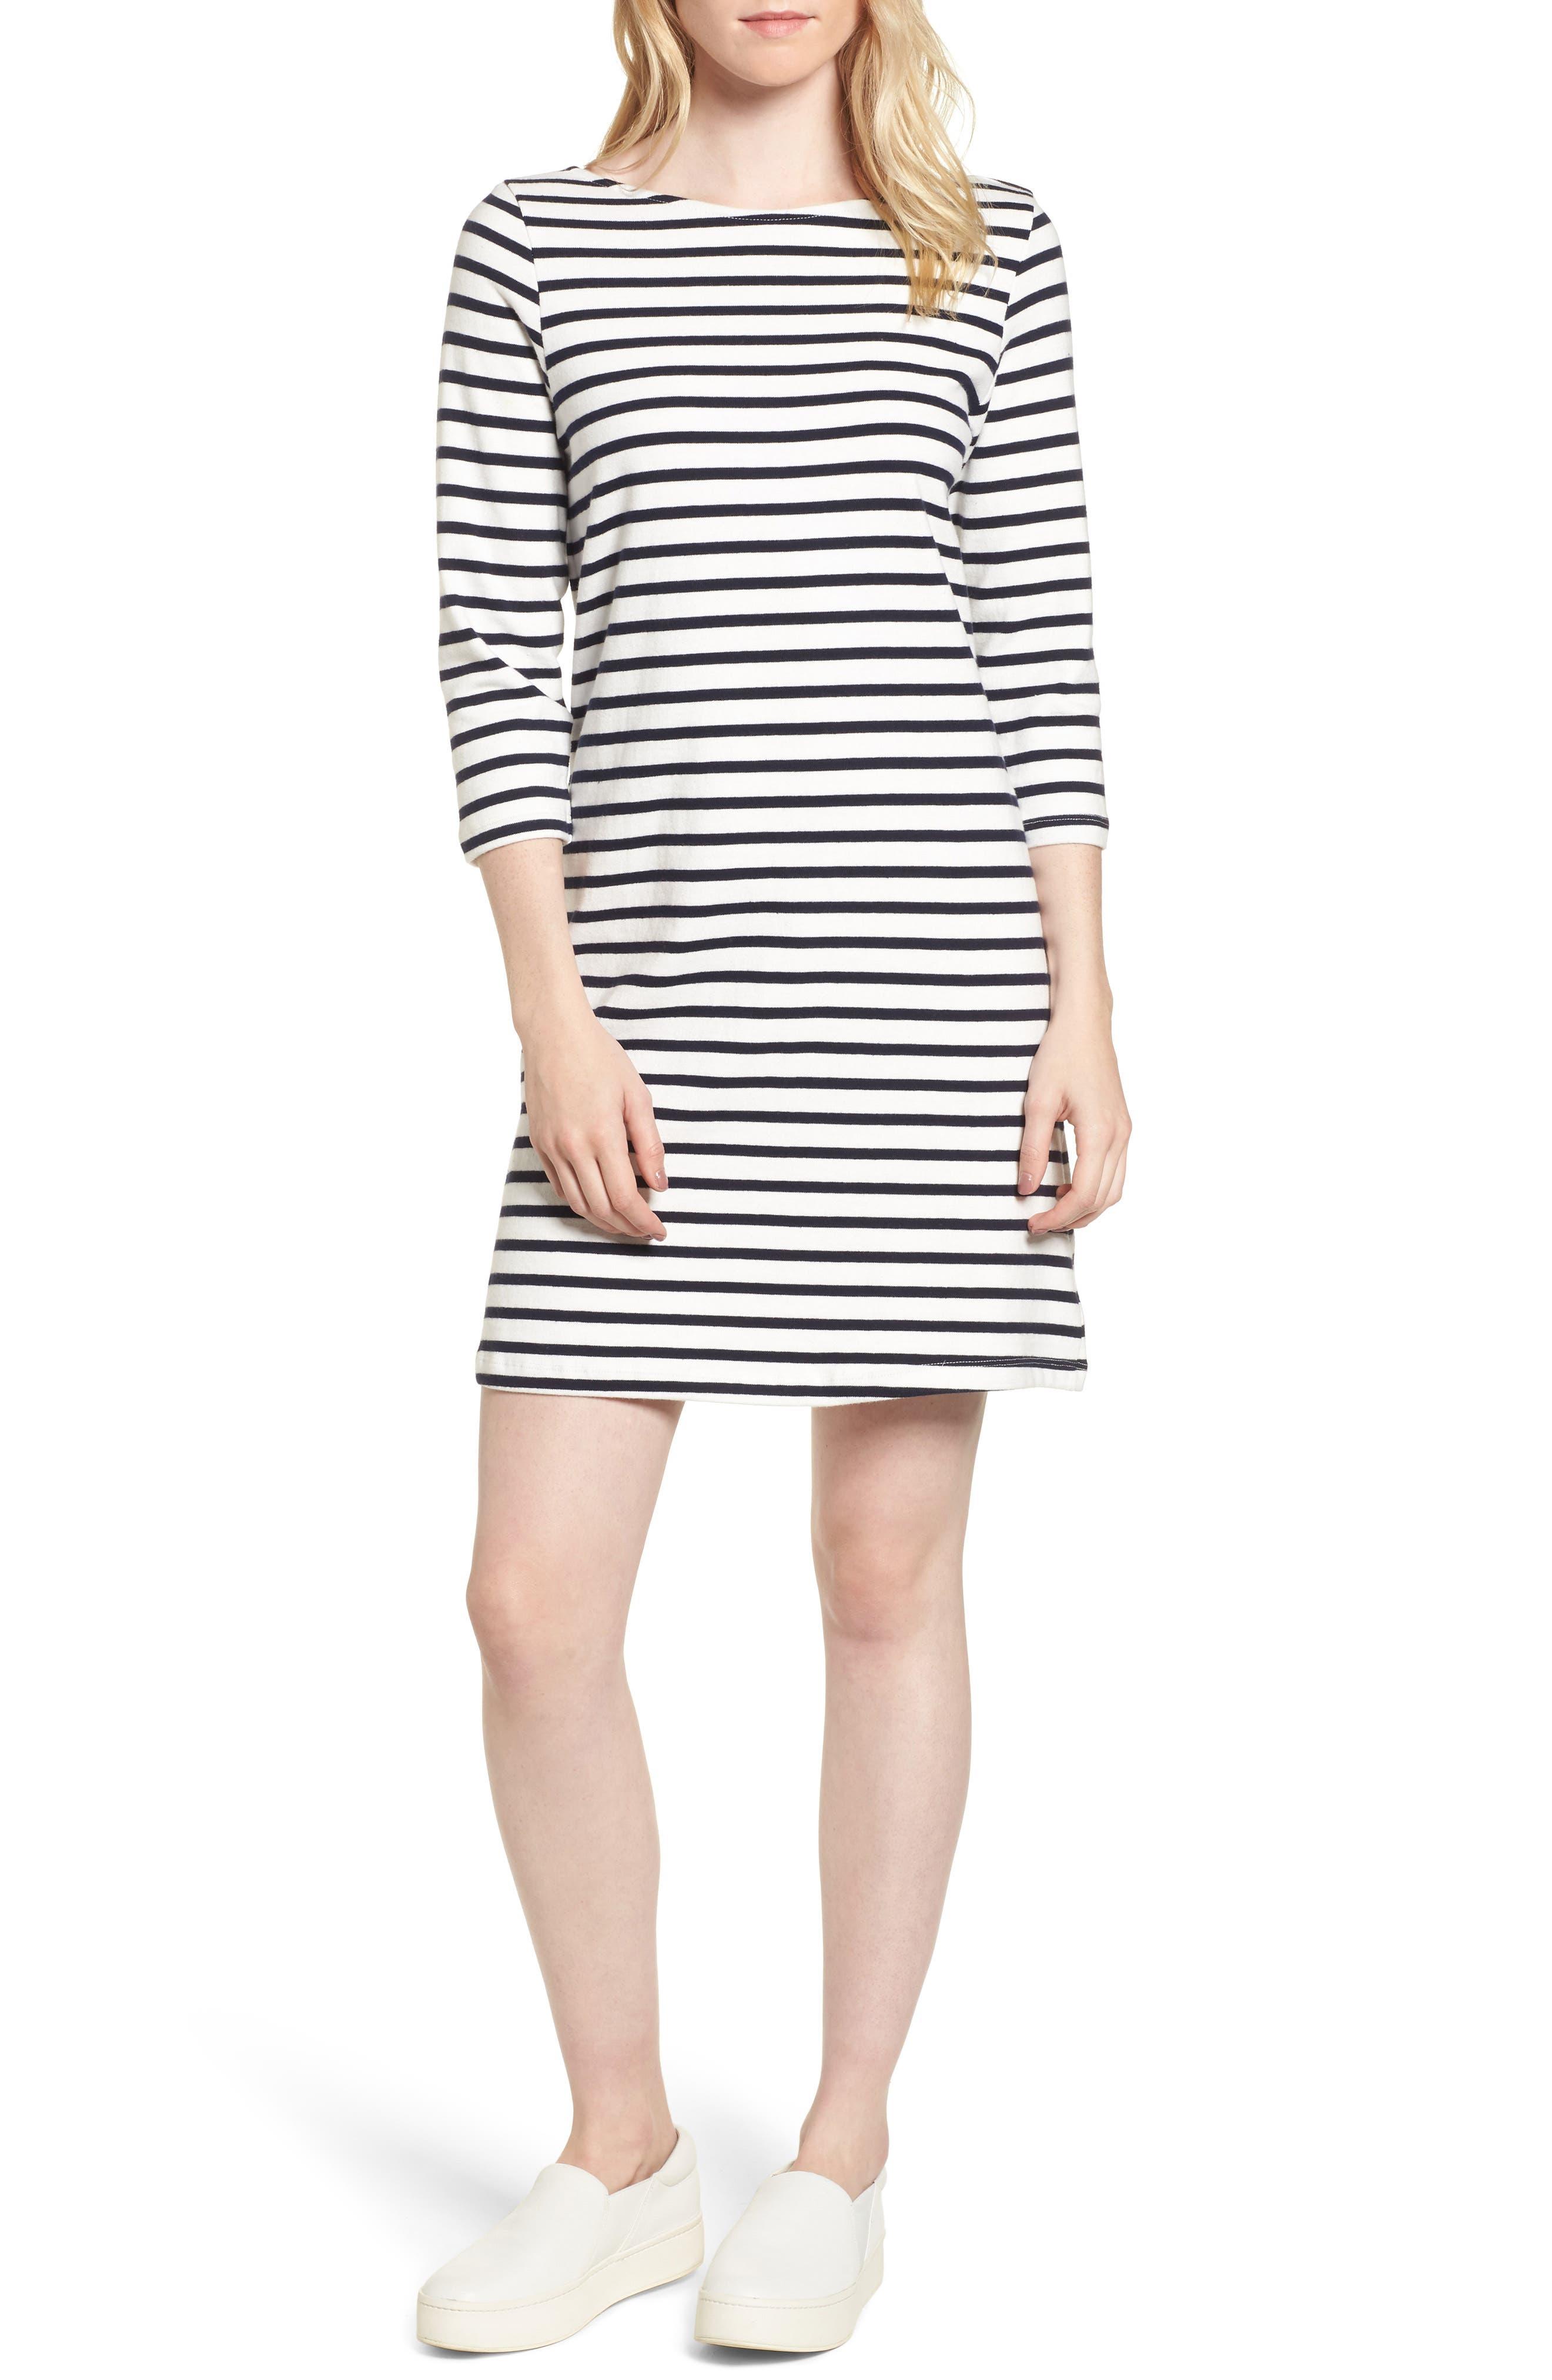 Trista Organic Cotton Dress,                         Main,                         color, Ivory/ Navy